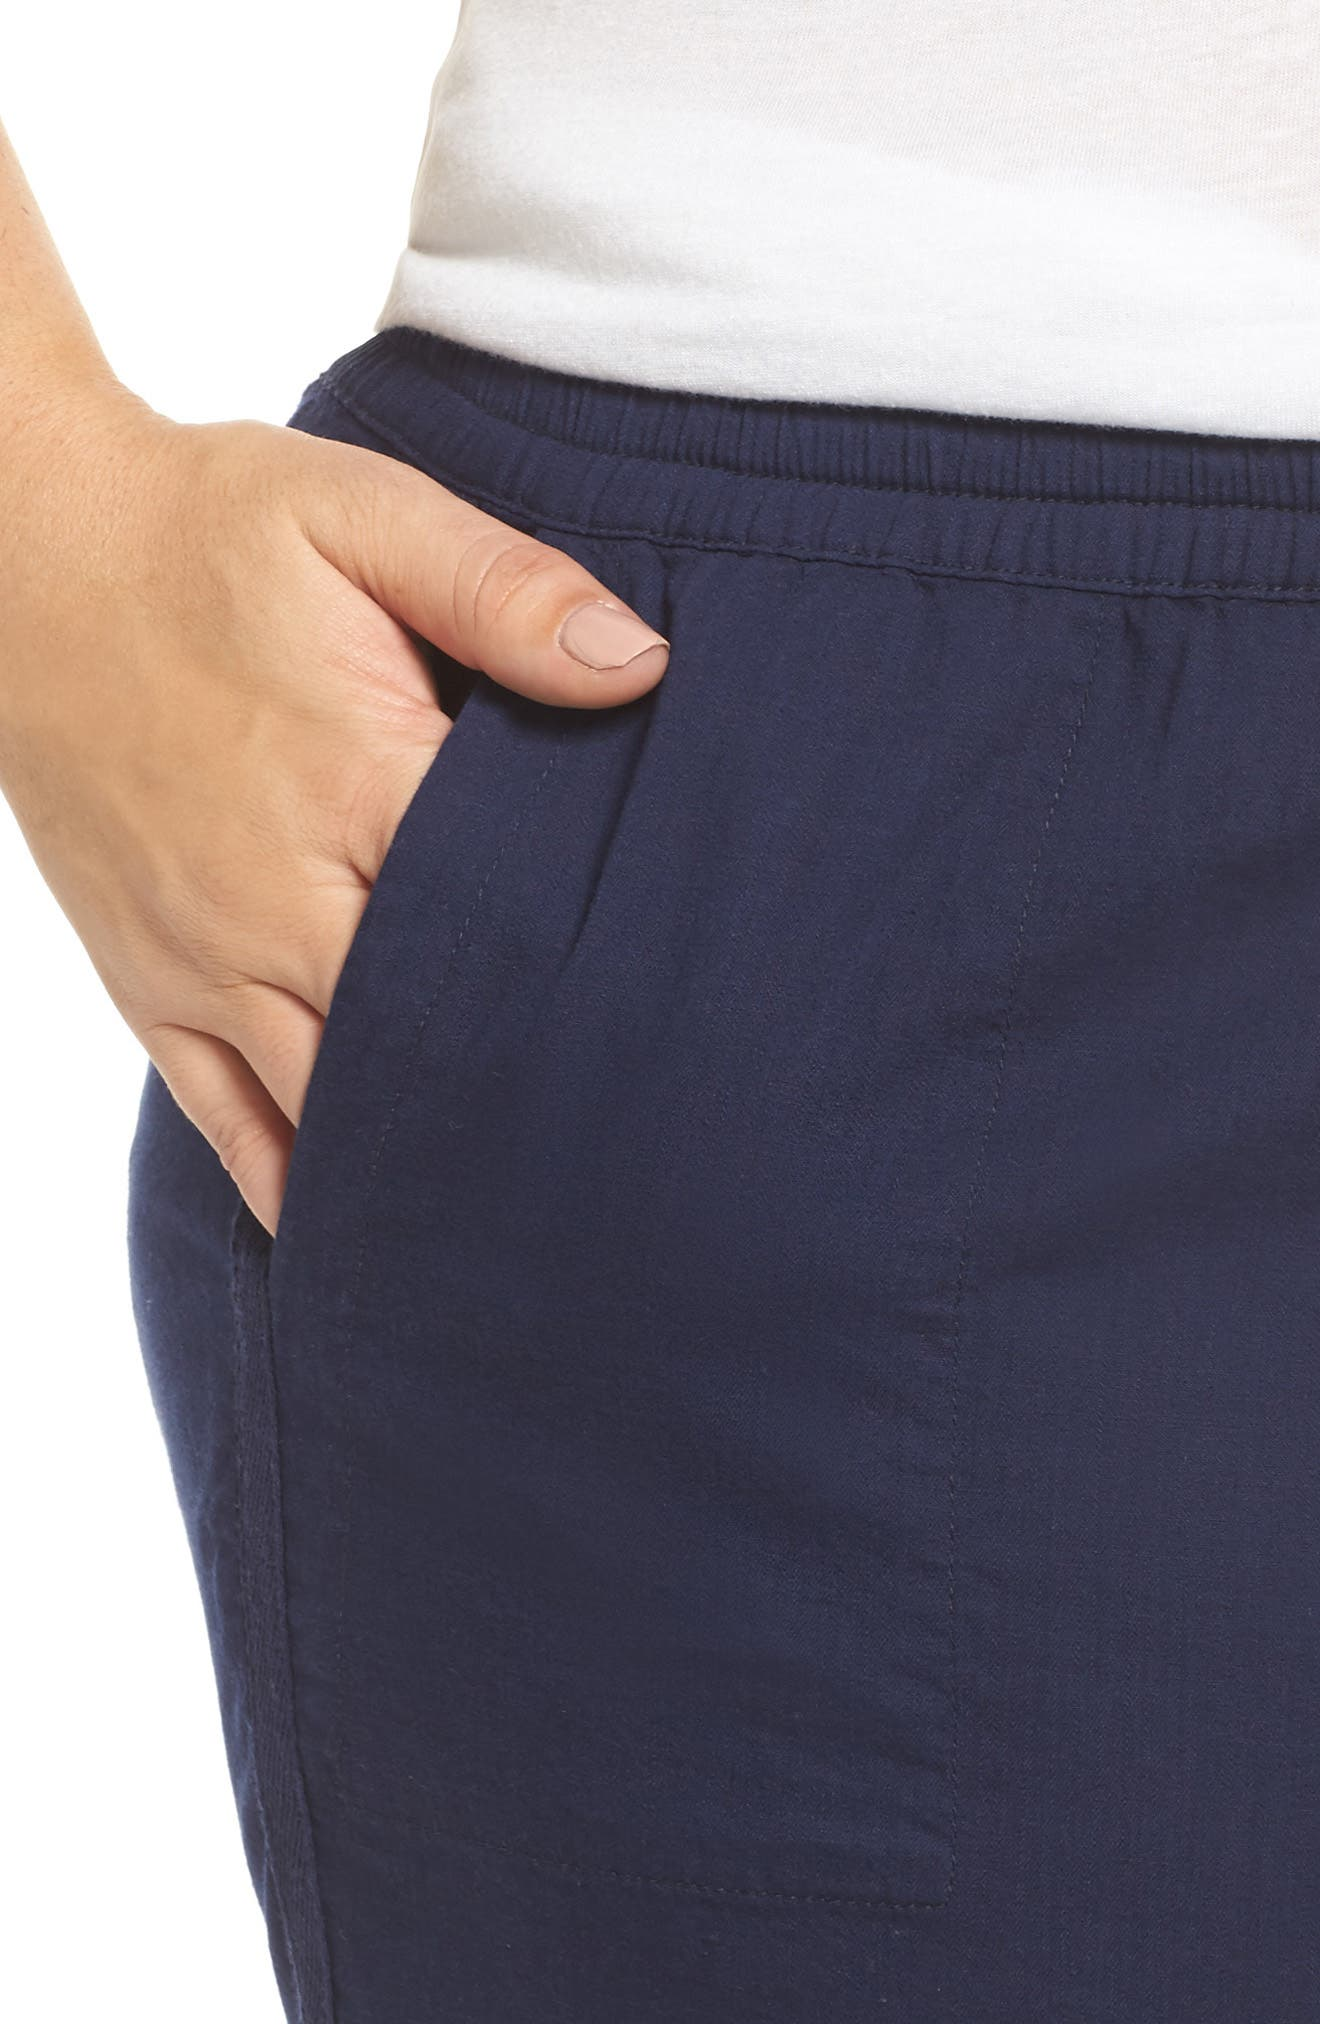 Pull-On Twill Shorts,                             Alternate thumbnail 4, color,                             NAVY PEACOAT